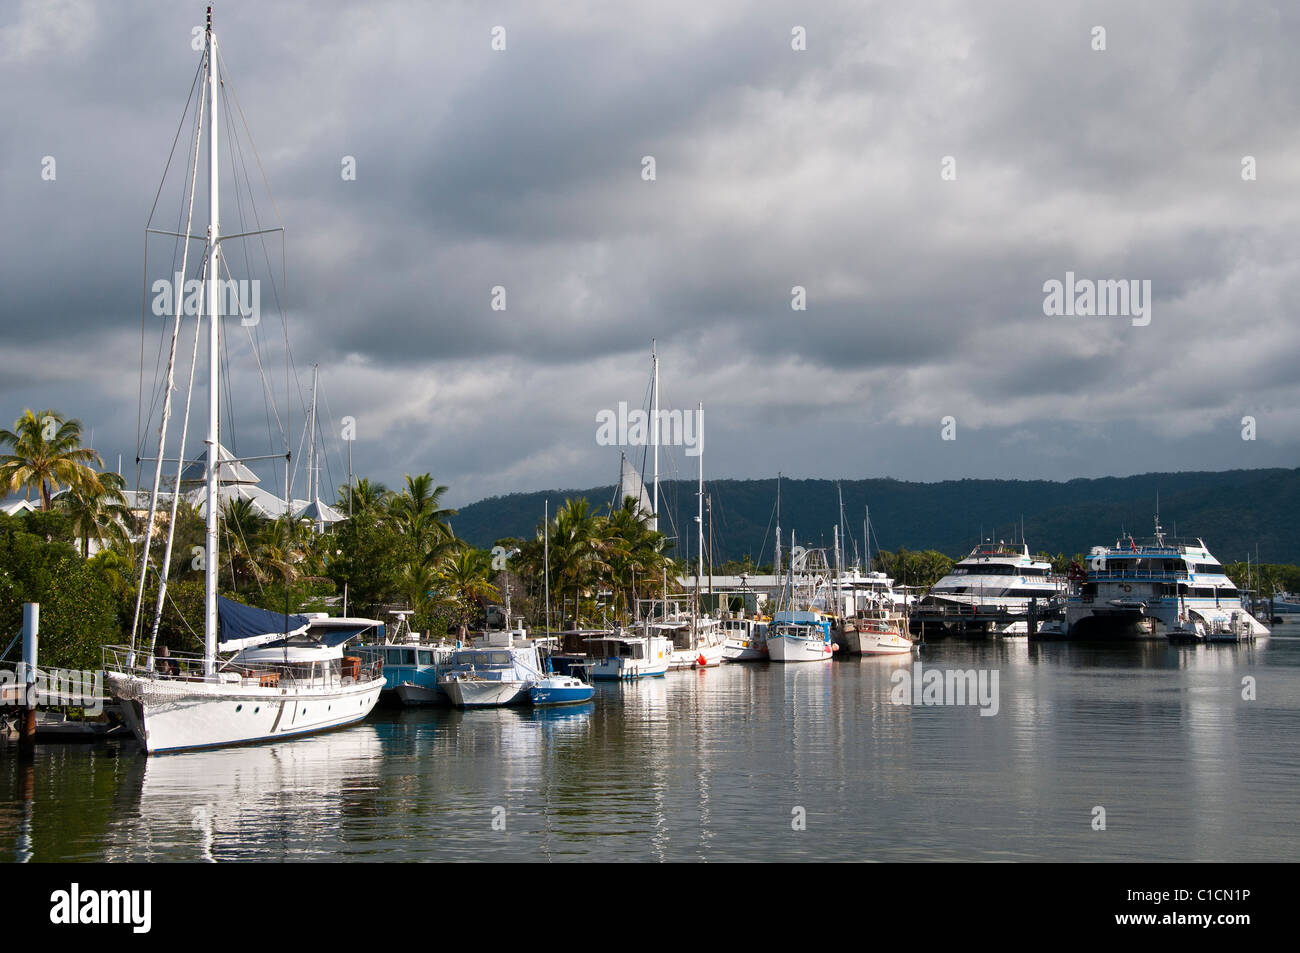 Harbor, Port Douglas, Queensland, Australia. - Stock Image